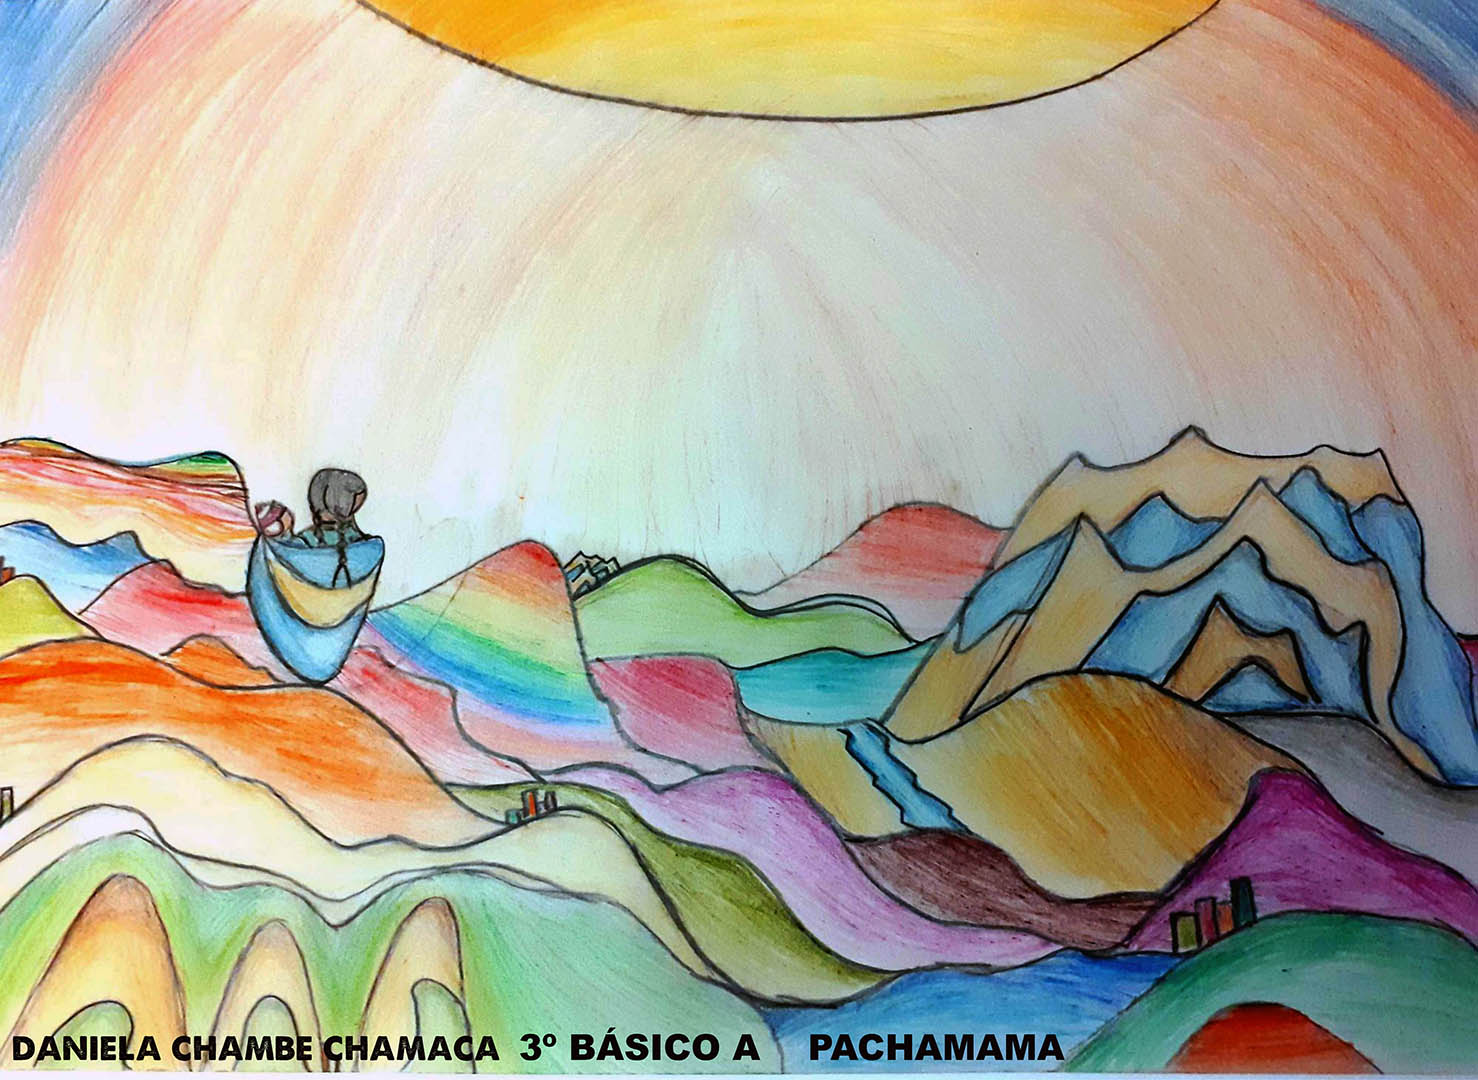 DANIELA CHAMBE CHAMACA5 3A